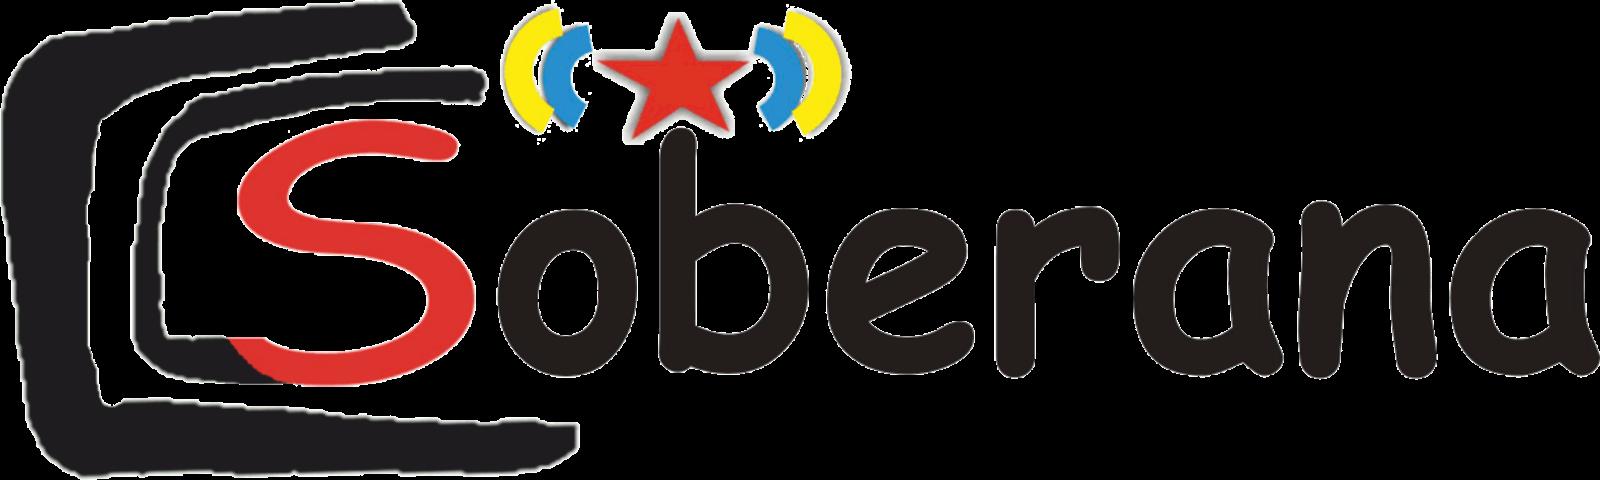 Radio Soberana 92.9 FM